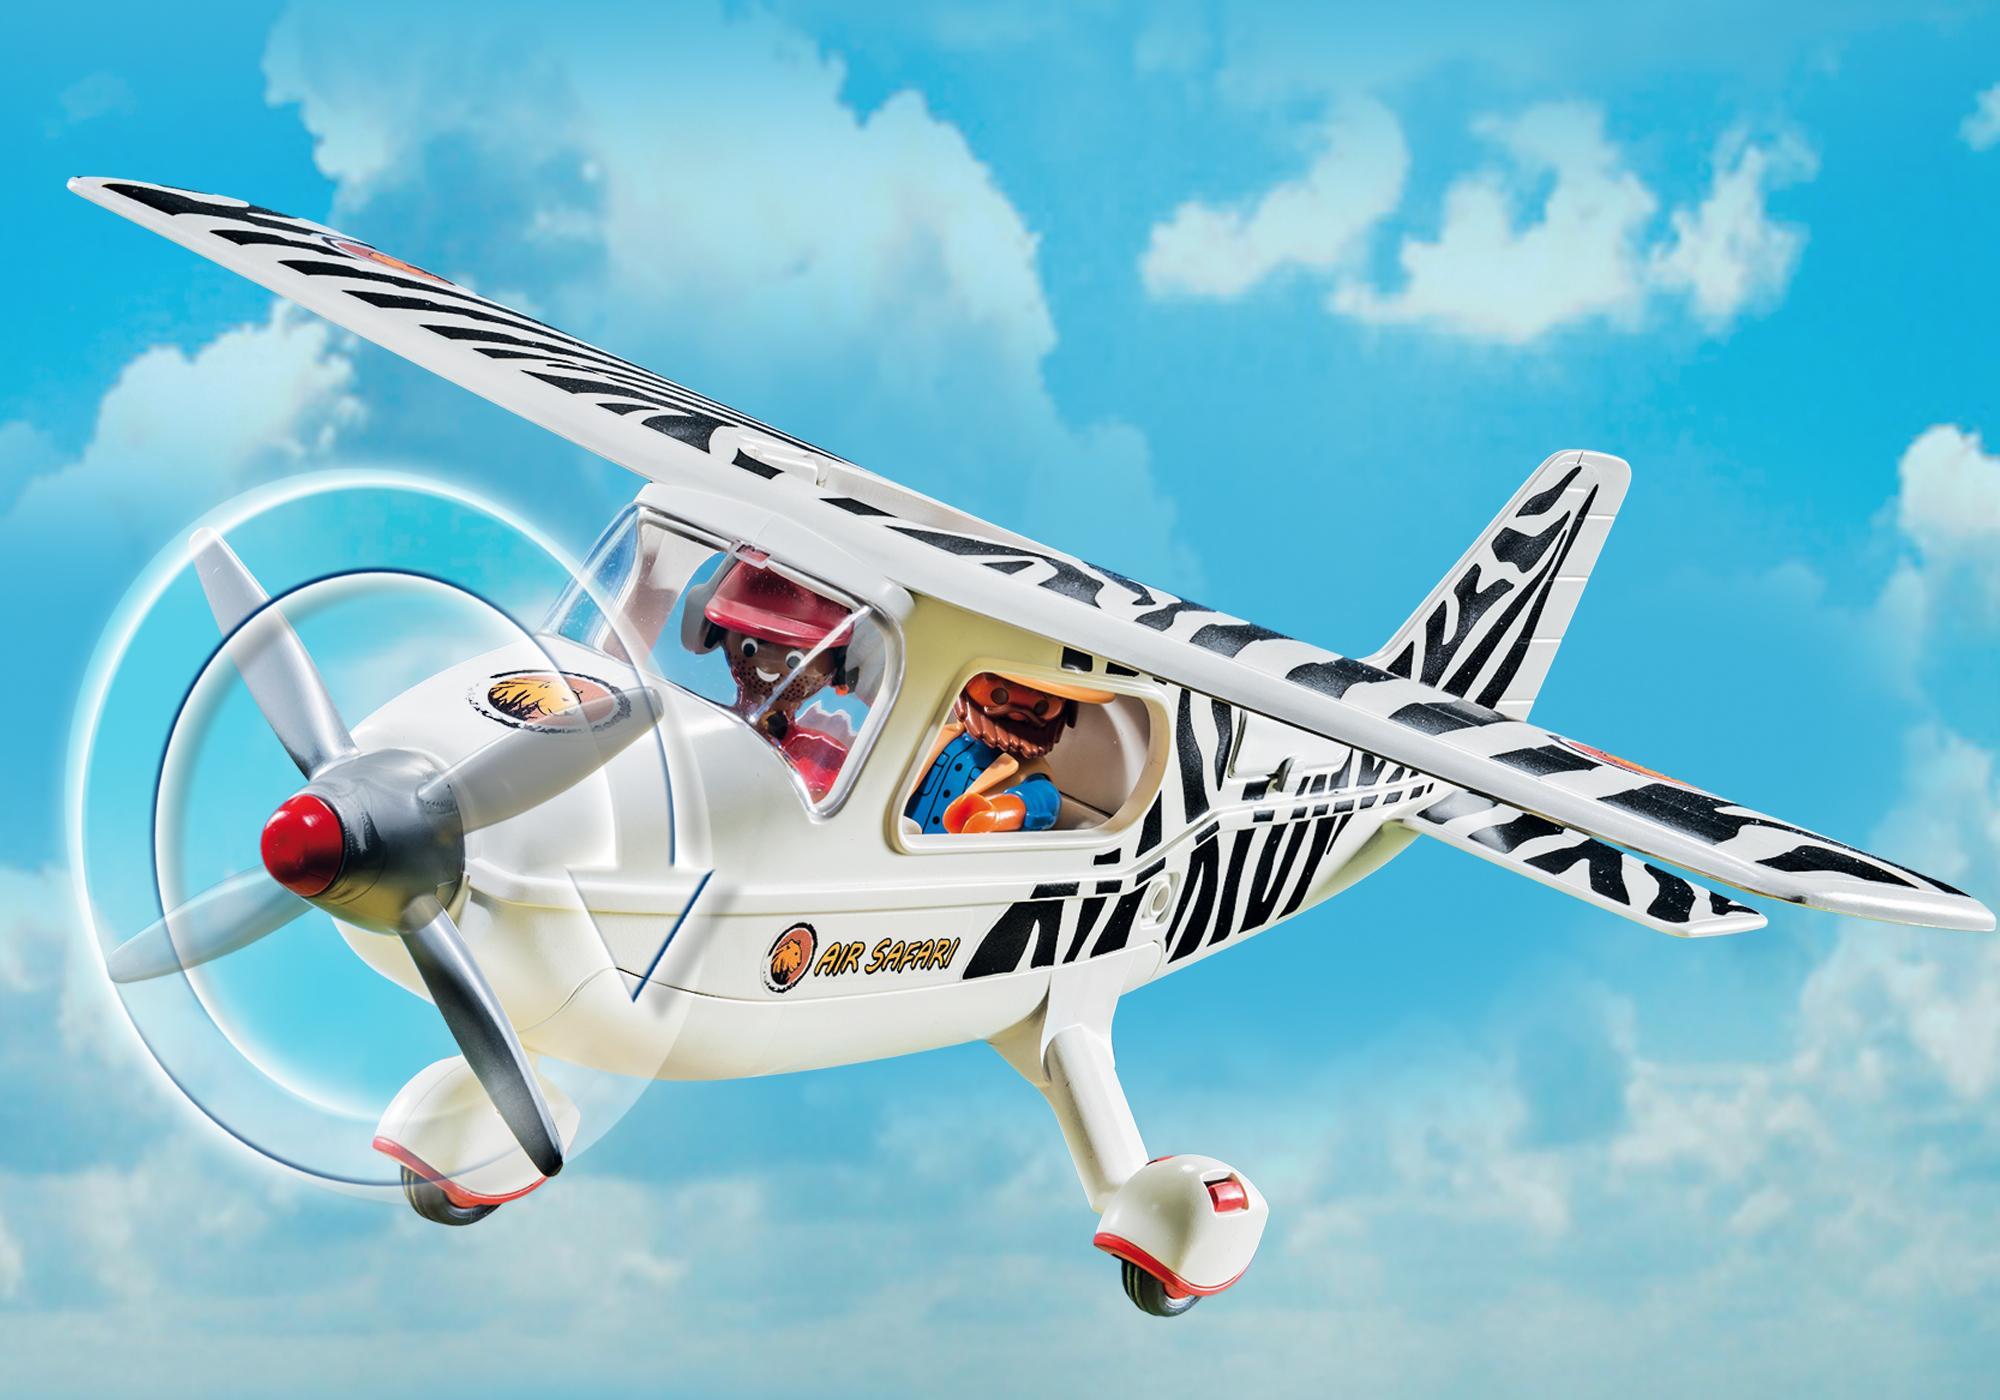 http://media.playmobil.com/i/playmobil/6938_product_extra2/Avion avec explorateurs